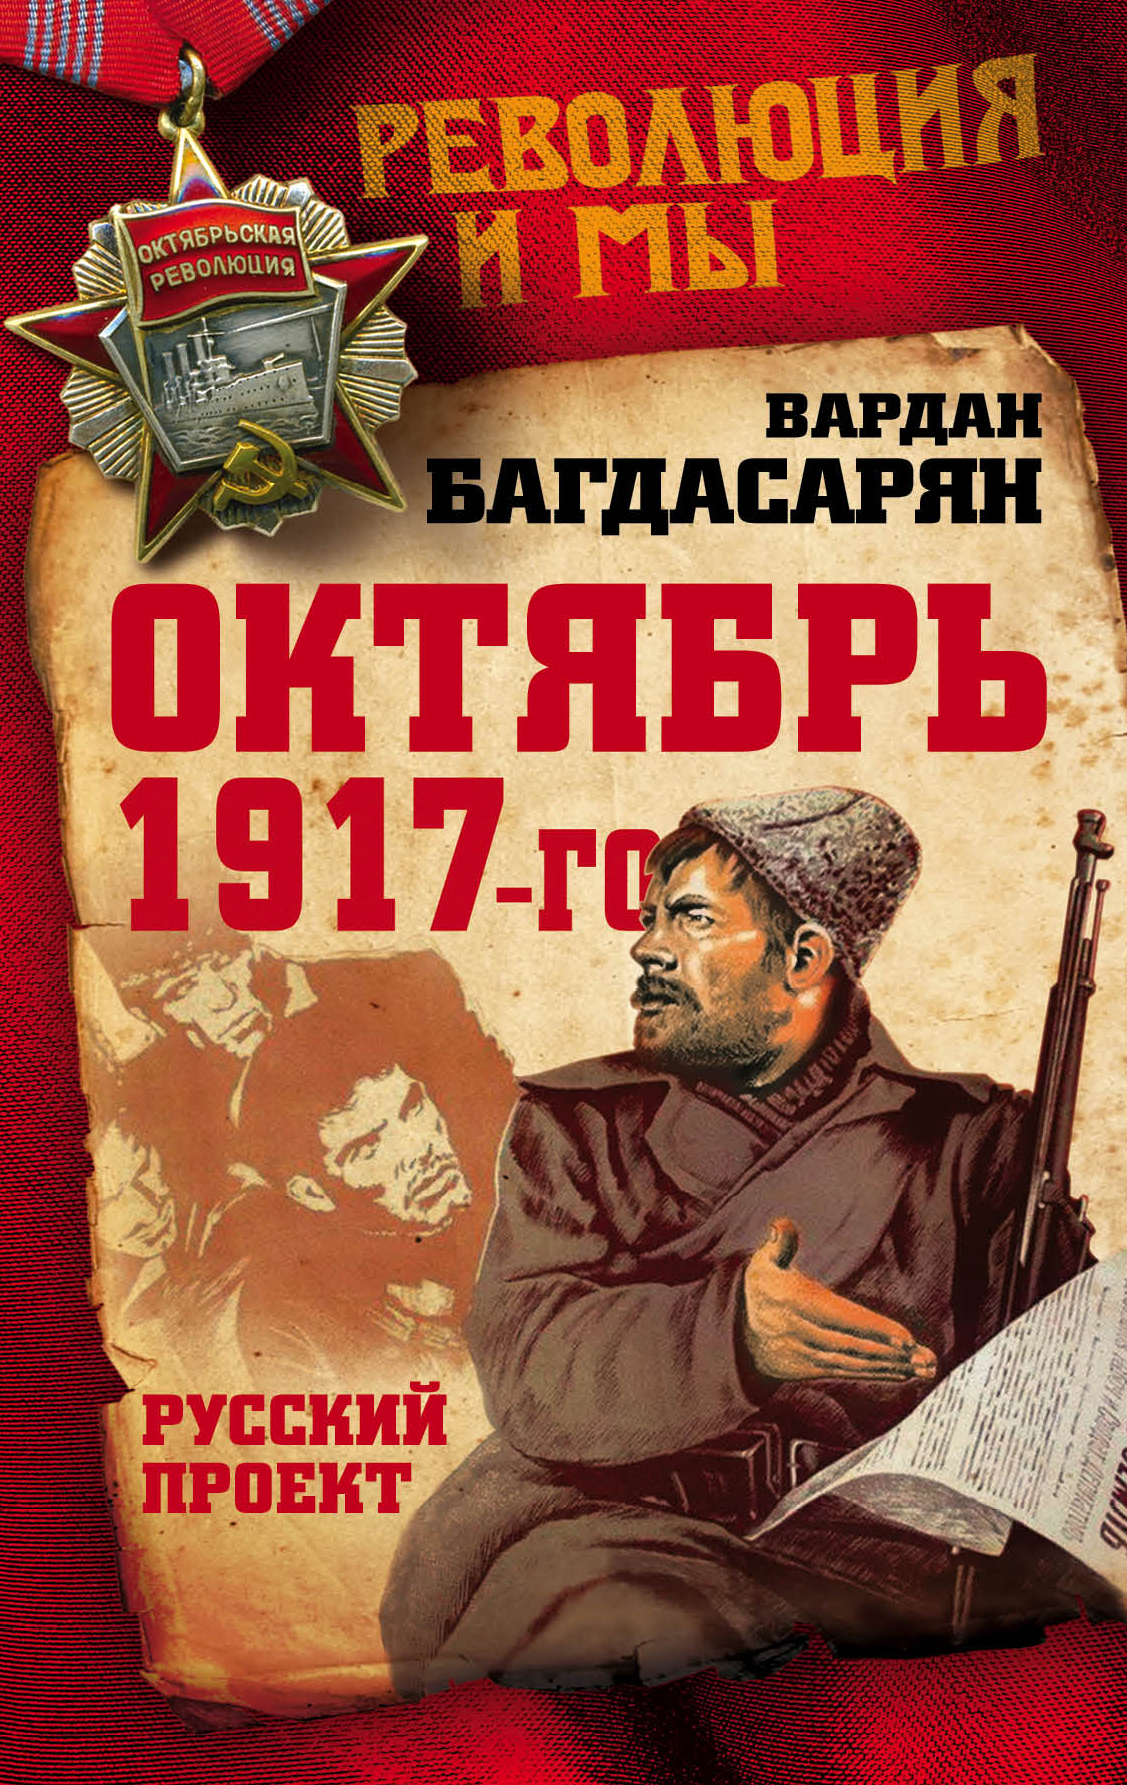 Багдасарян Вардан Эрнестович Октябрь 1917-го. Русский проект